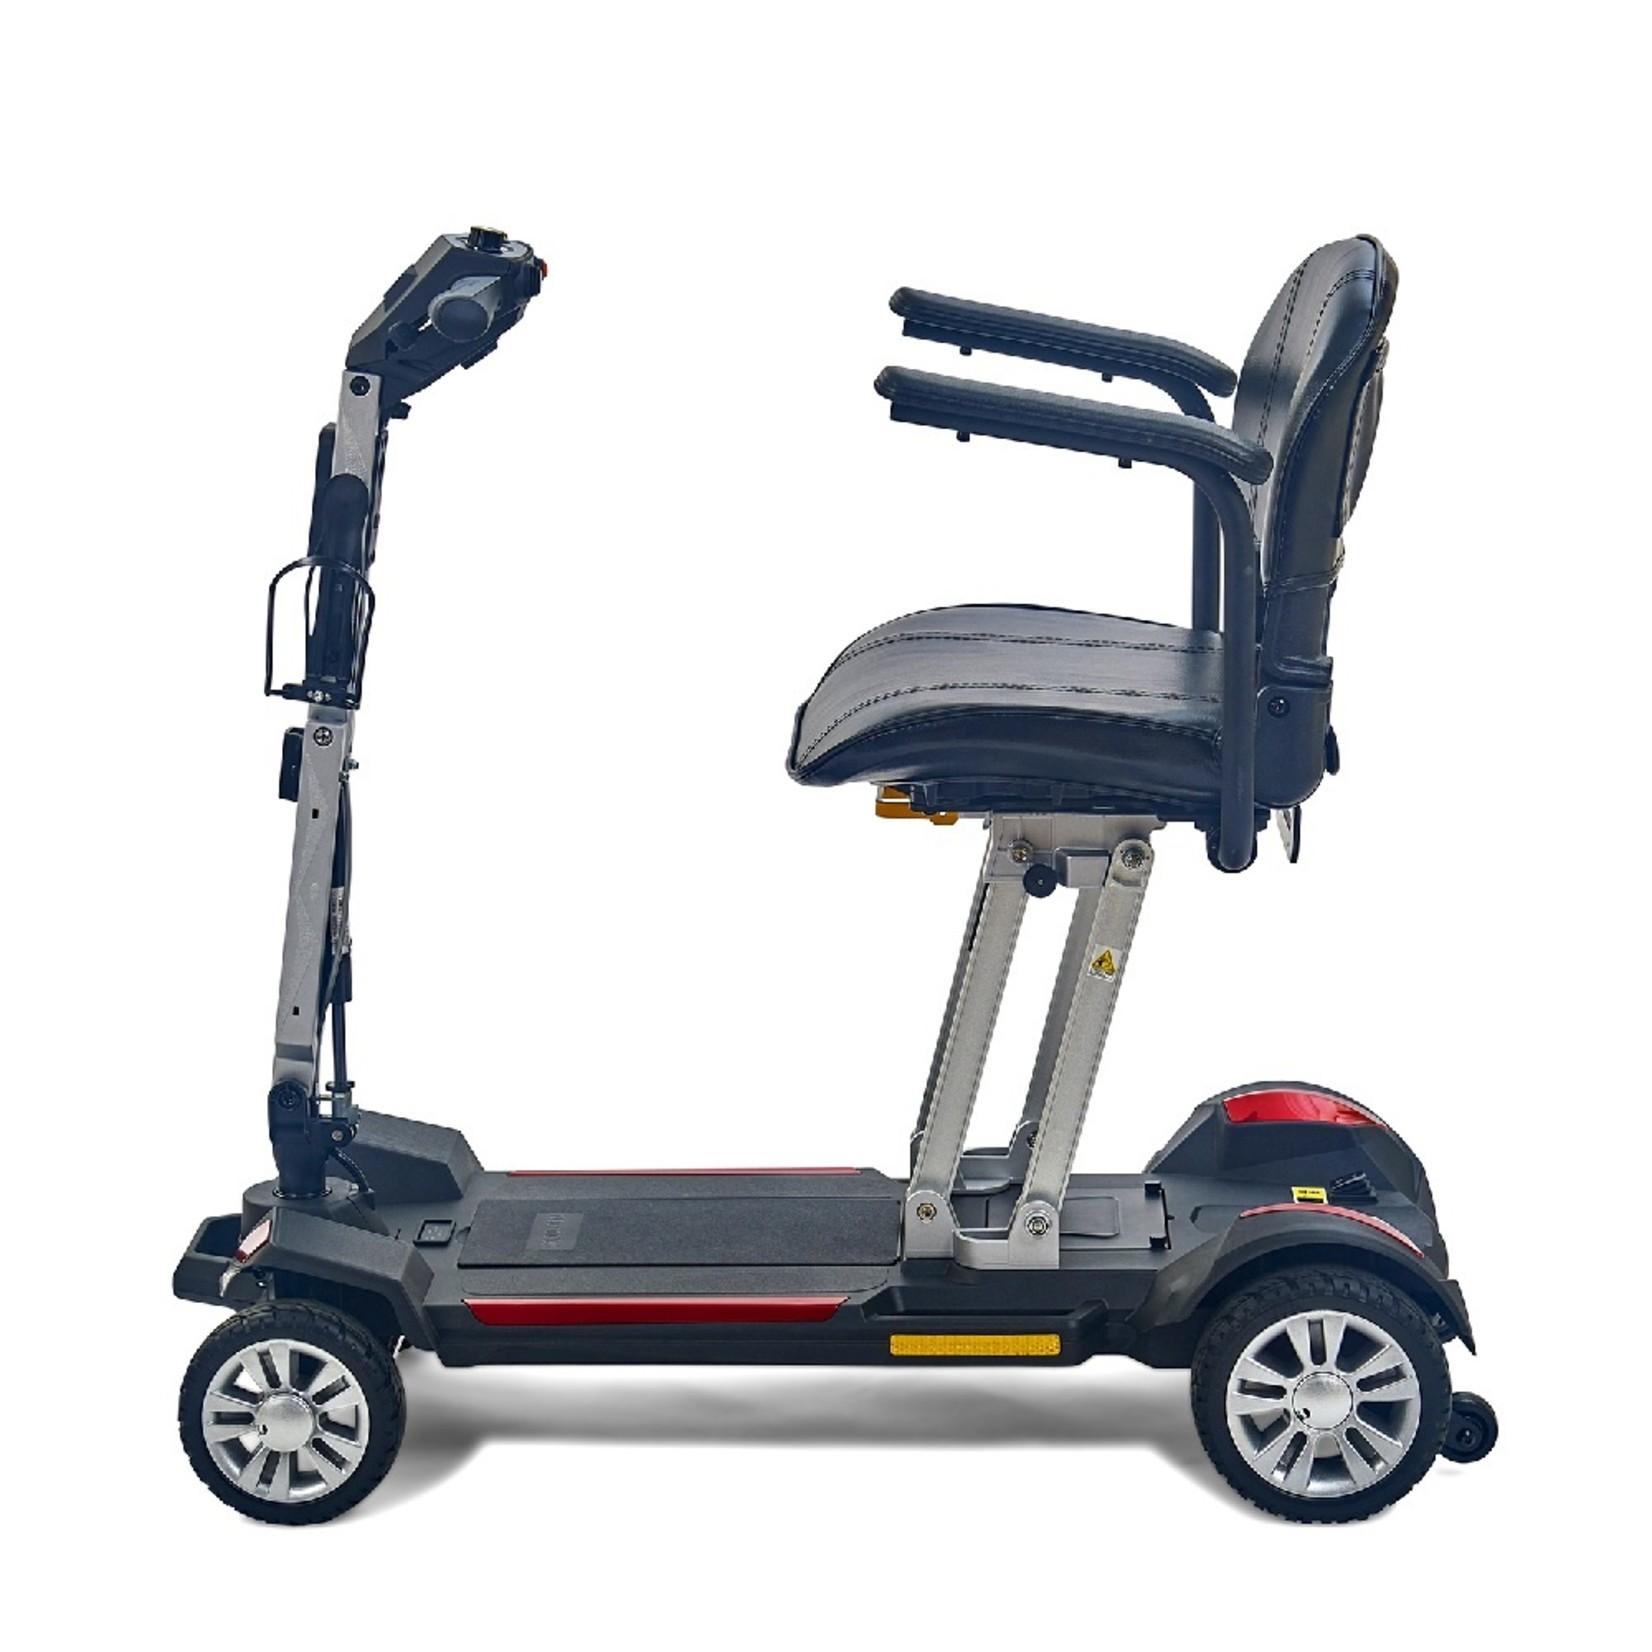 Golden Technologies Buzzaround CarryOn 4-Wheel Scooters